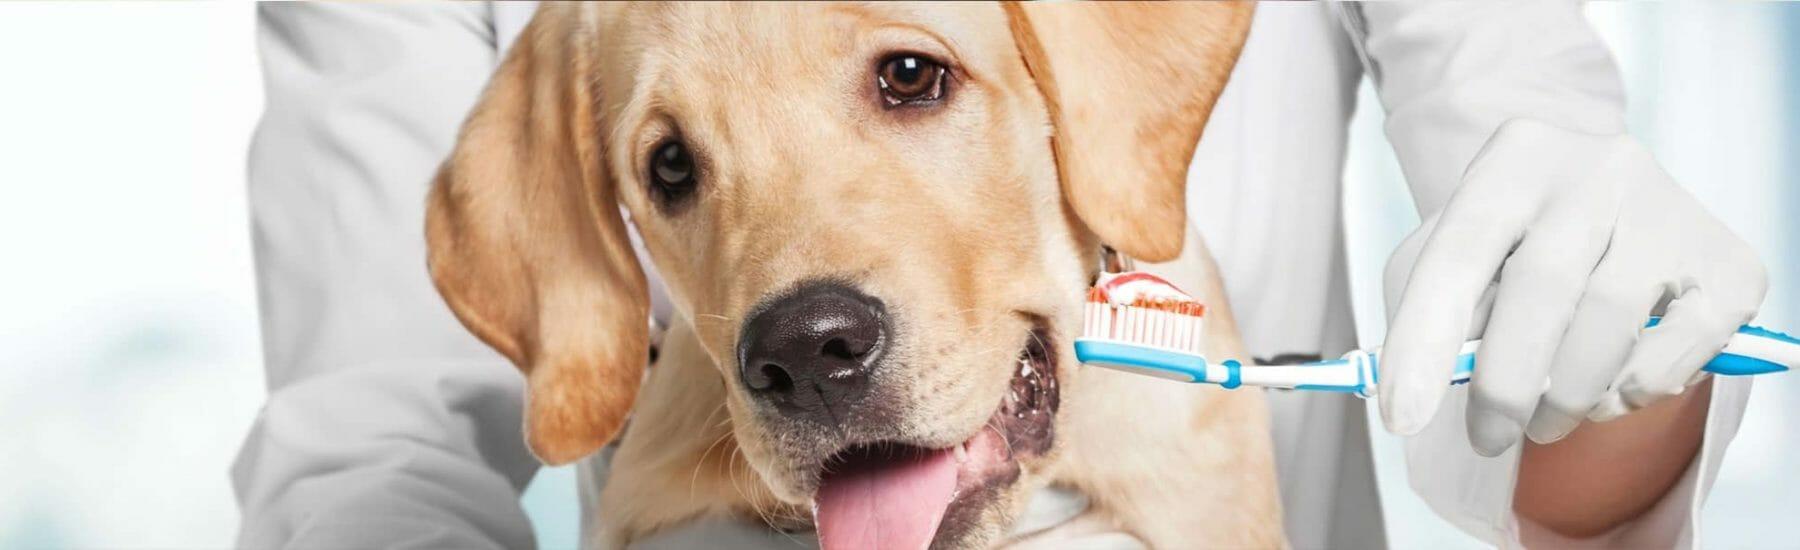 Golden dog having their teeth brushed